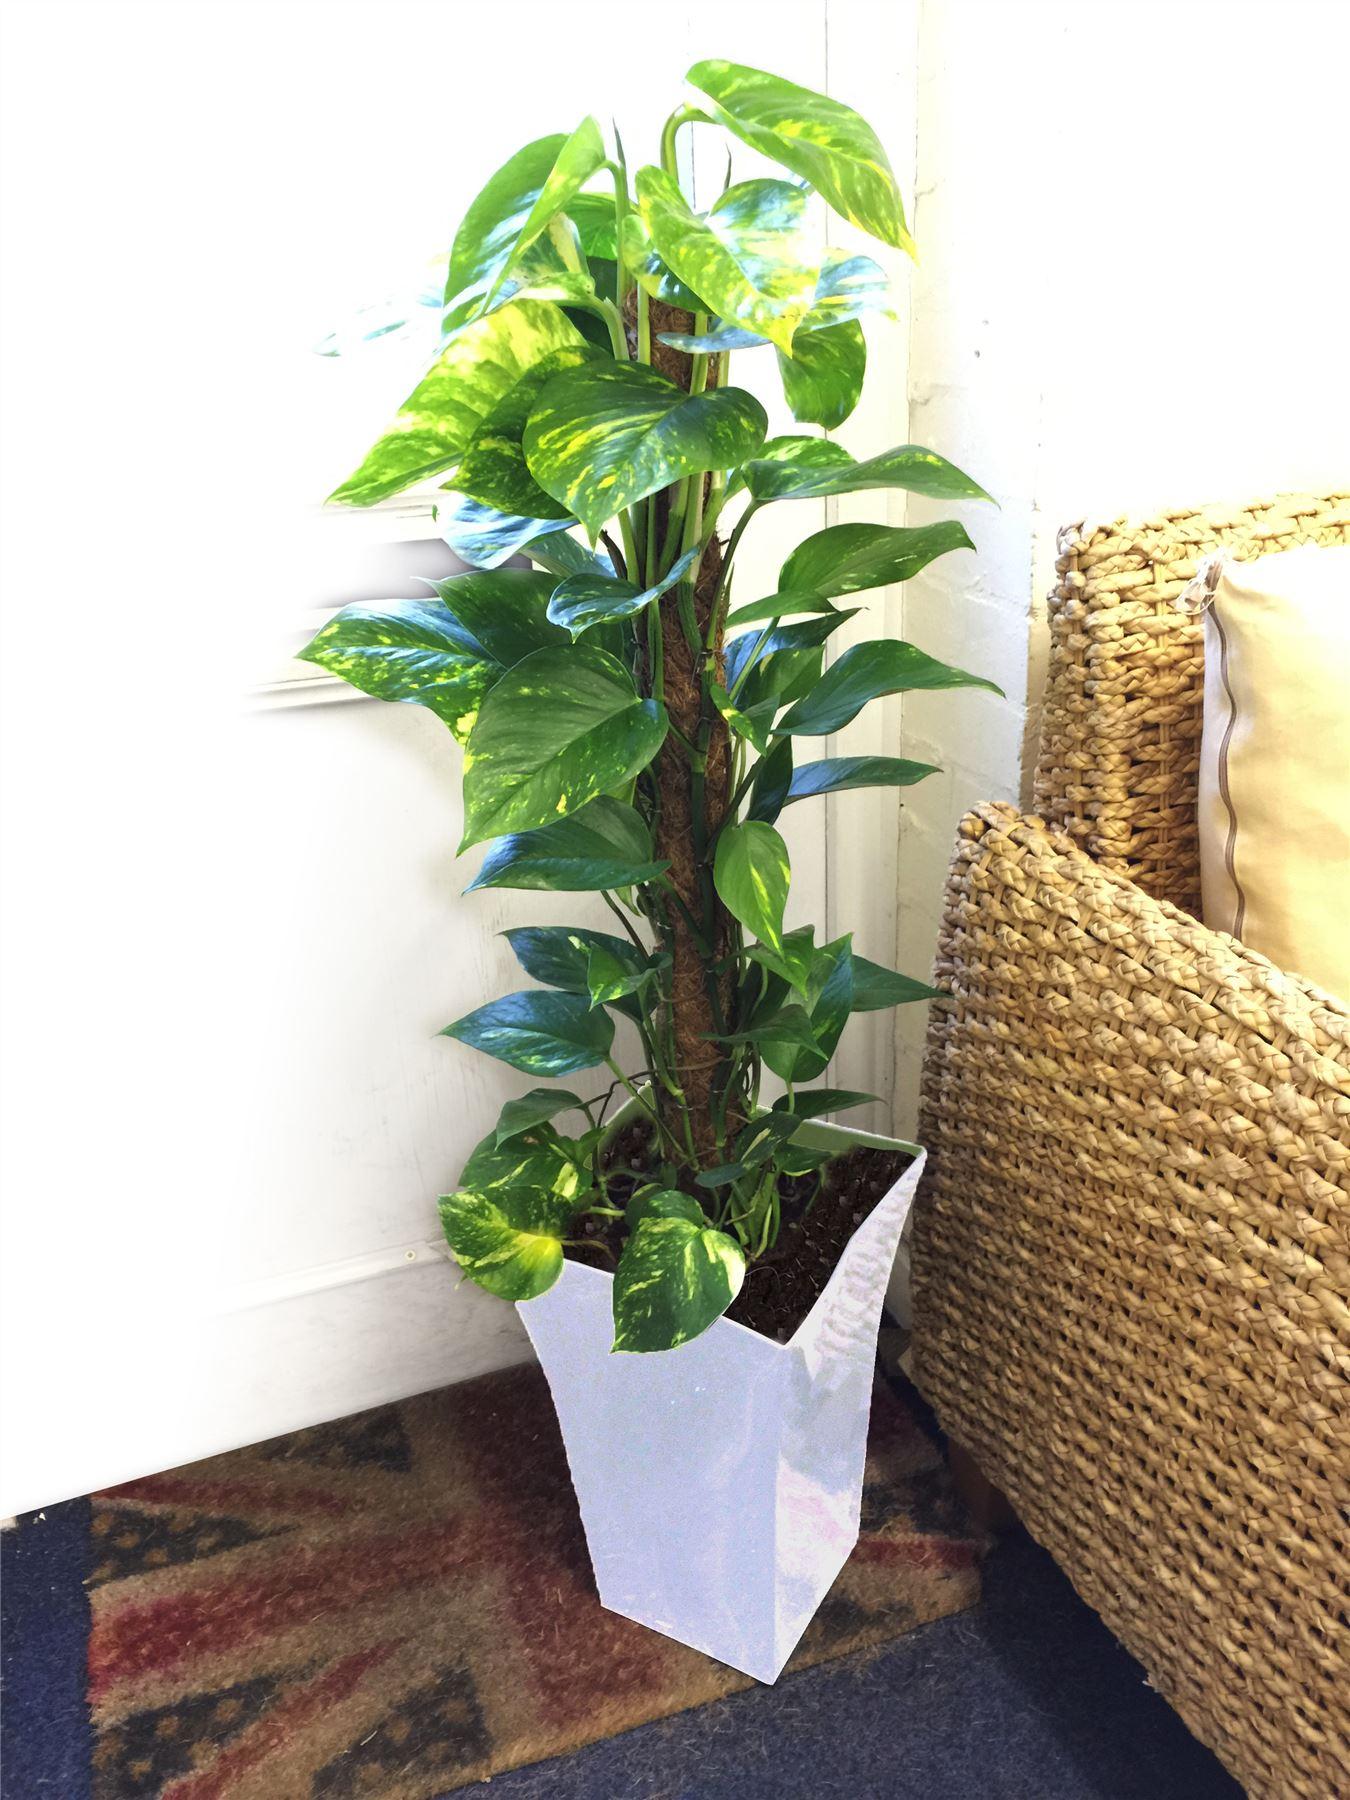 House Plants Large Golden Pothos Devil's Ivy House Office ... on ivy houseplant, yucca elephantipes house plant, ivy water plant, ivy ice plant, ivy flower, ivy indoor plant,